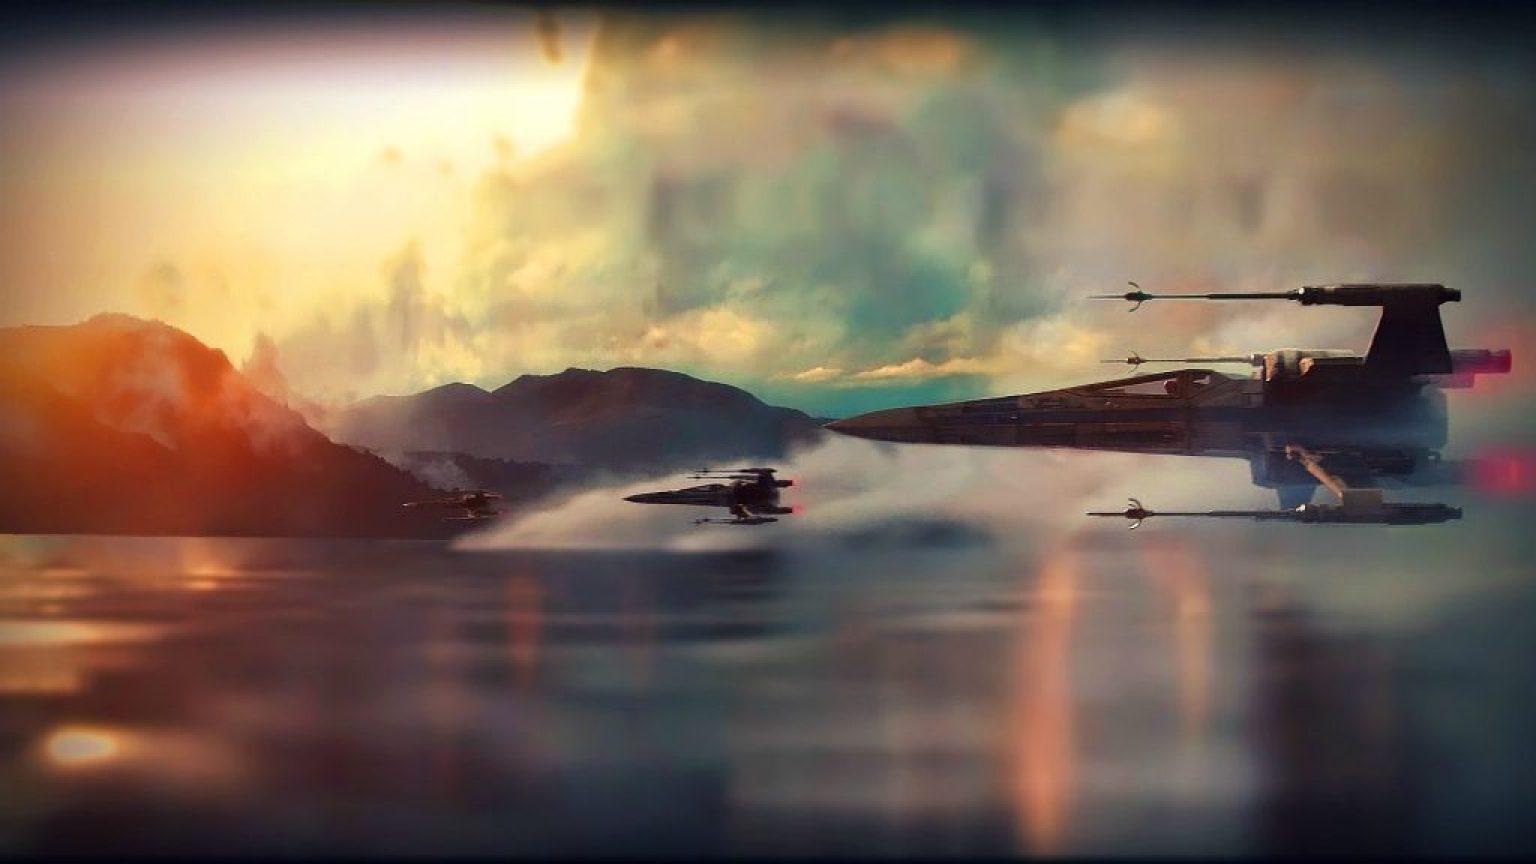 fondo_pantalla_star_wars_la_fuerza